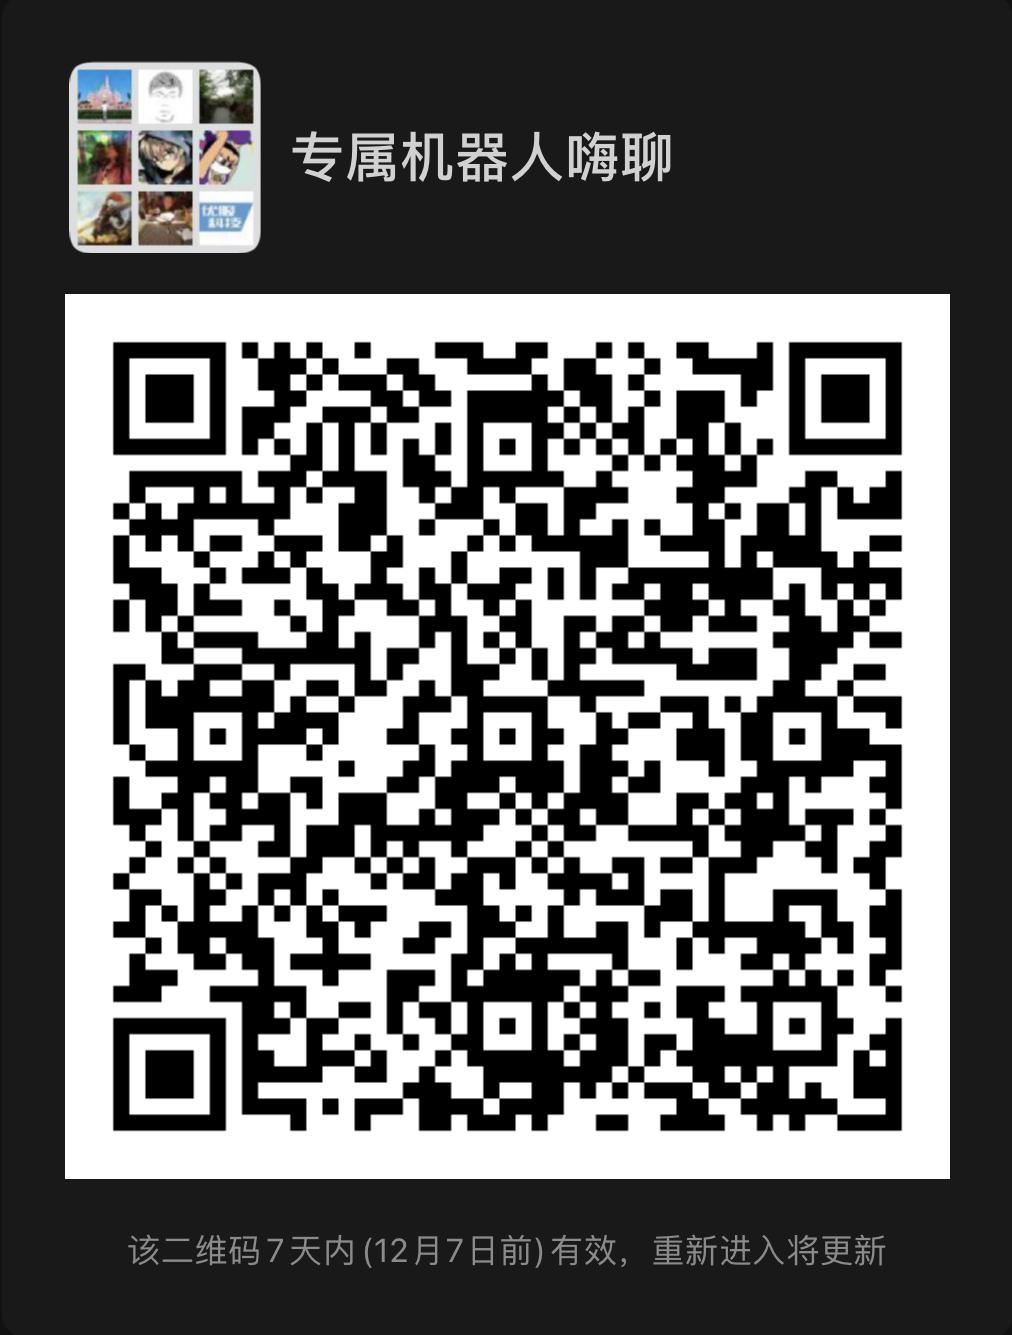 WechatIMG1334.png